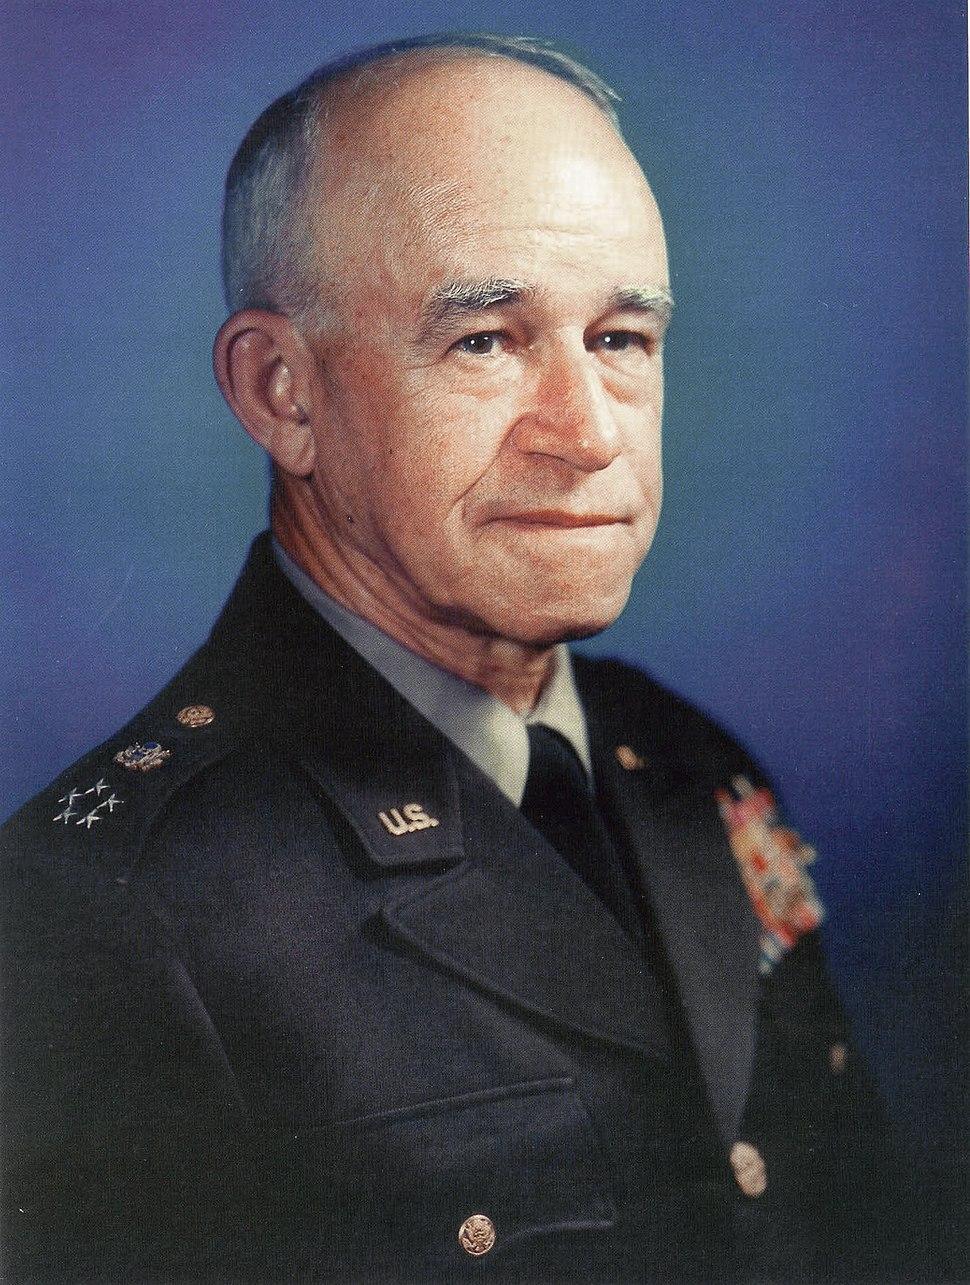 General of the Army Omar Bradley